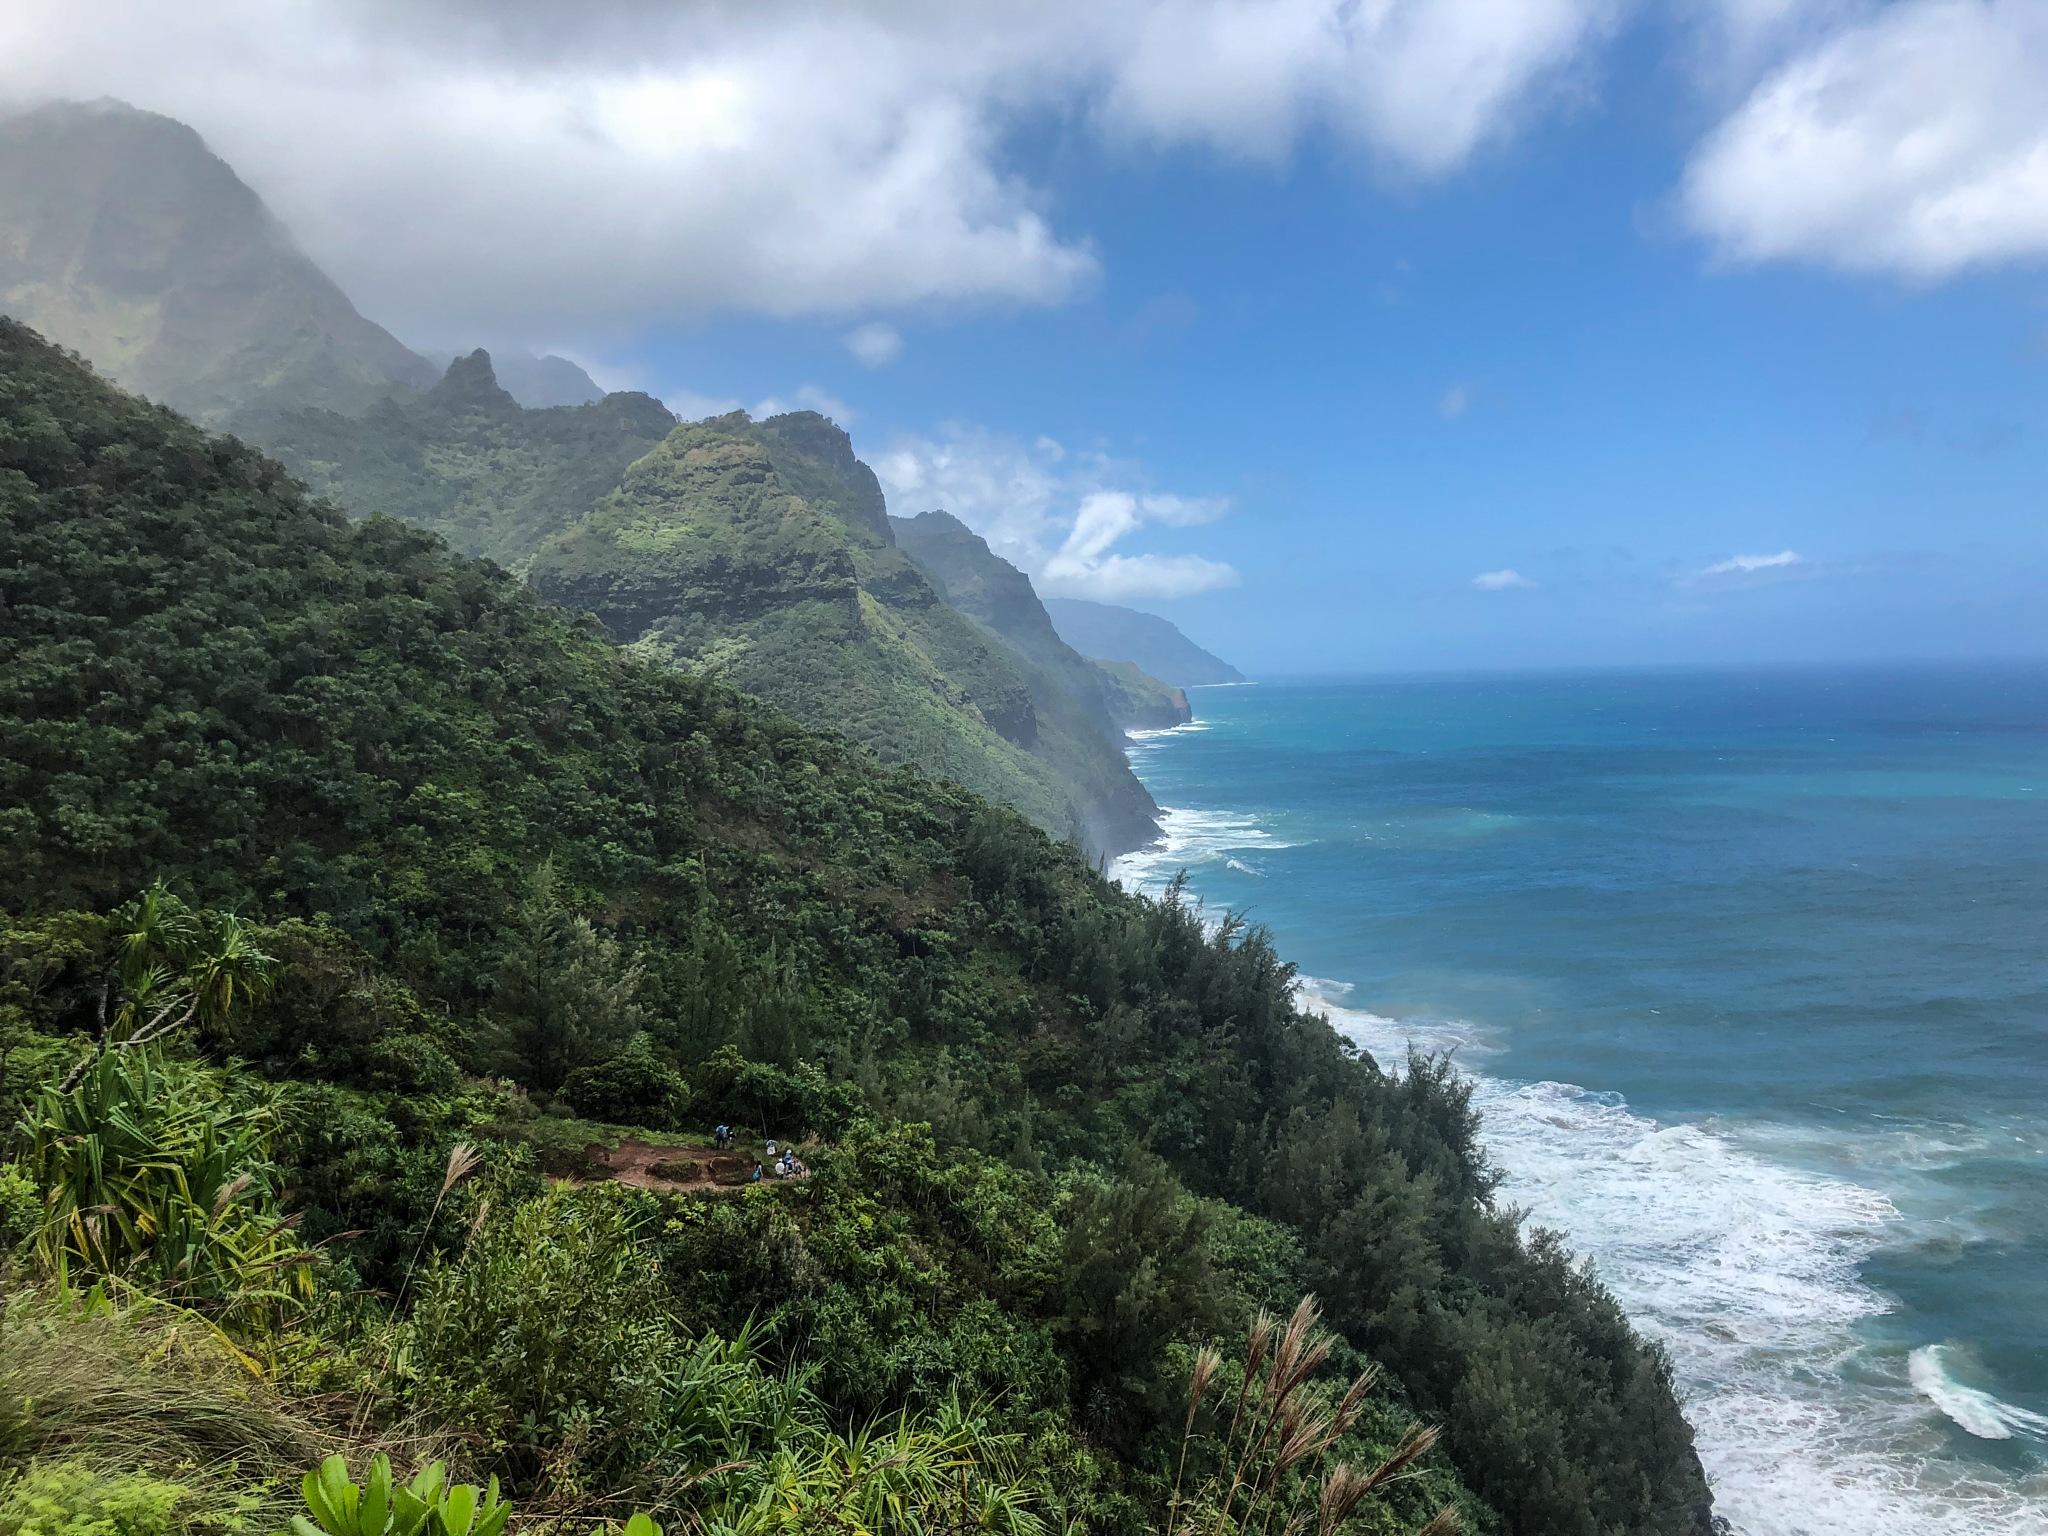 Hawaii Coast line by Krishna Murukutla